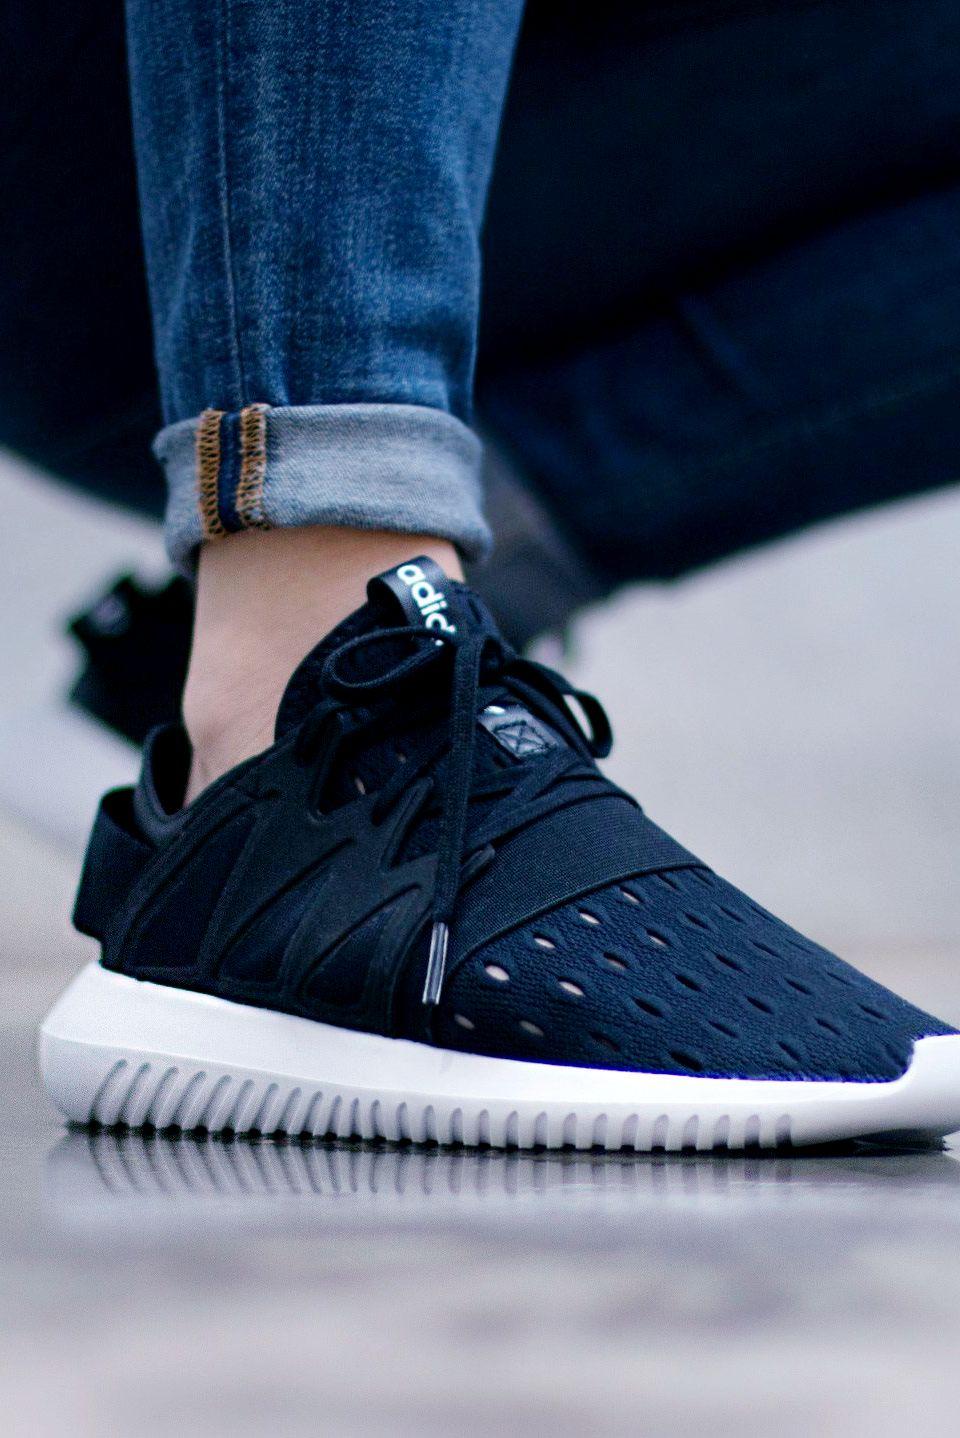 0e495b4ff907 adidas Tubular Viral W  Black   White  (via Kicks-daily.com)